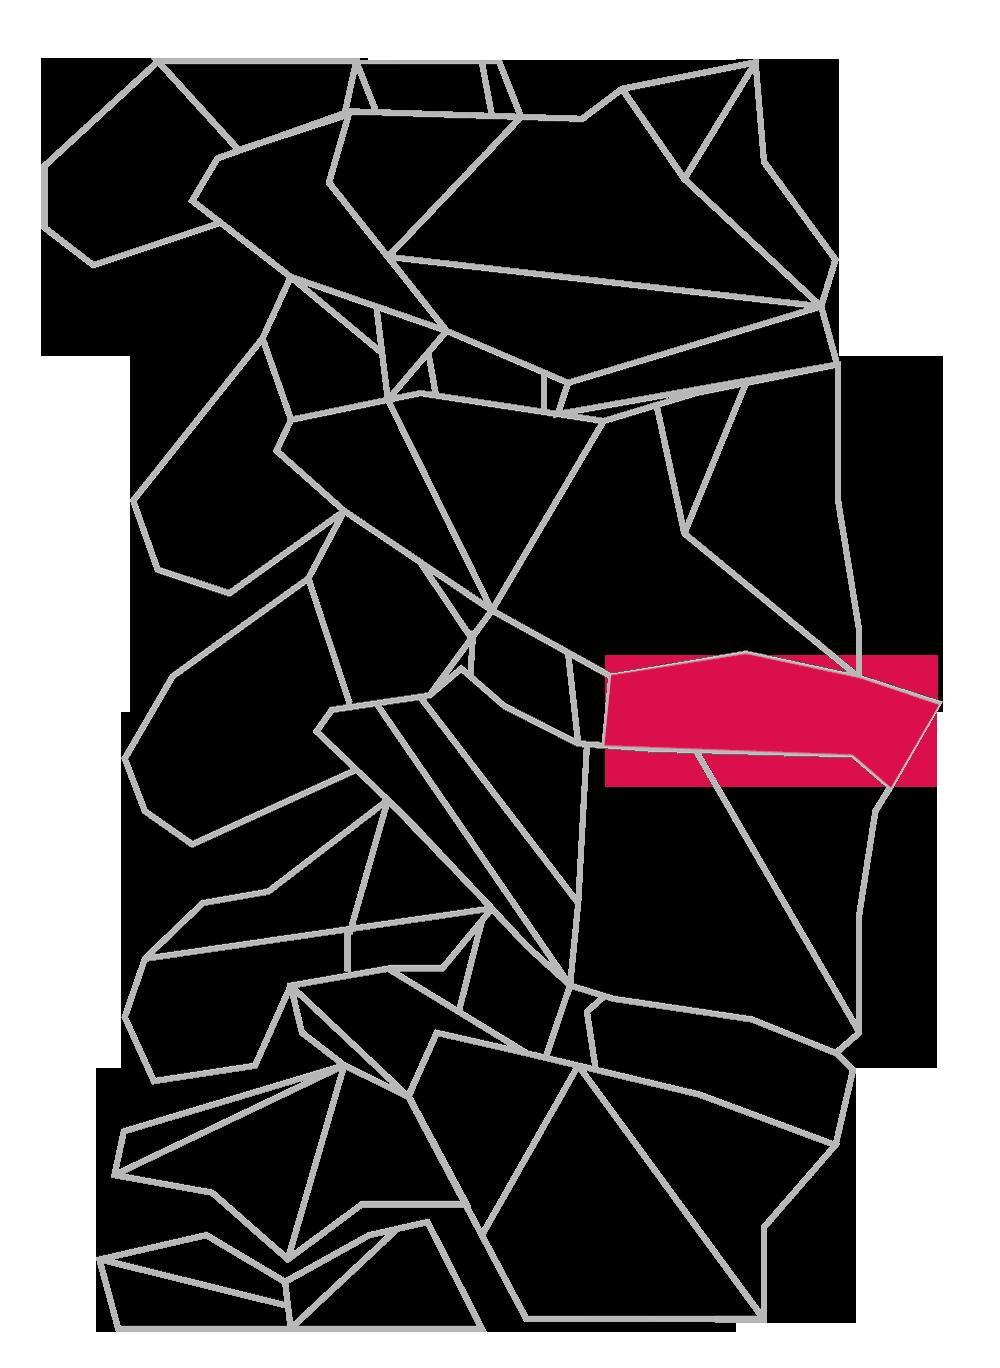 conceptual spine